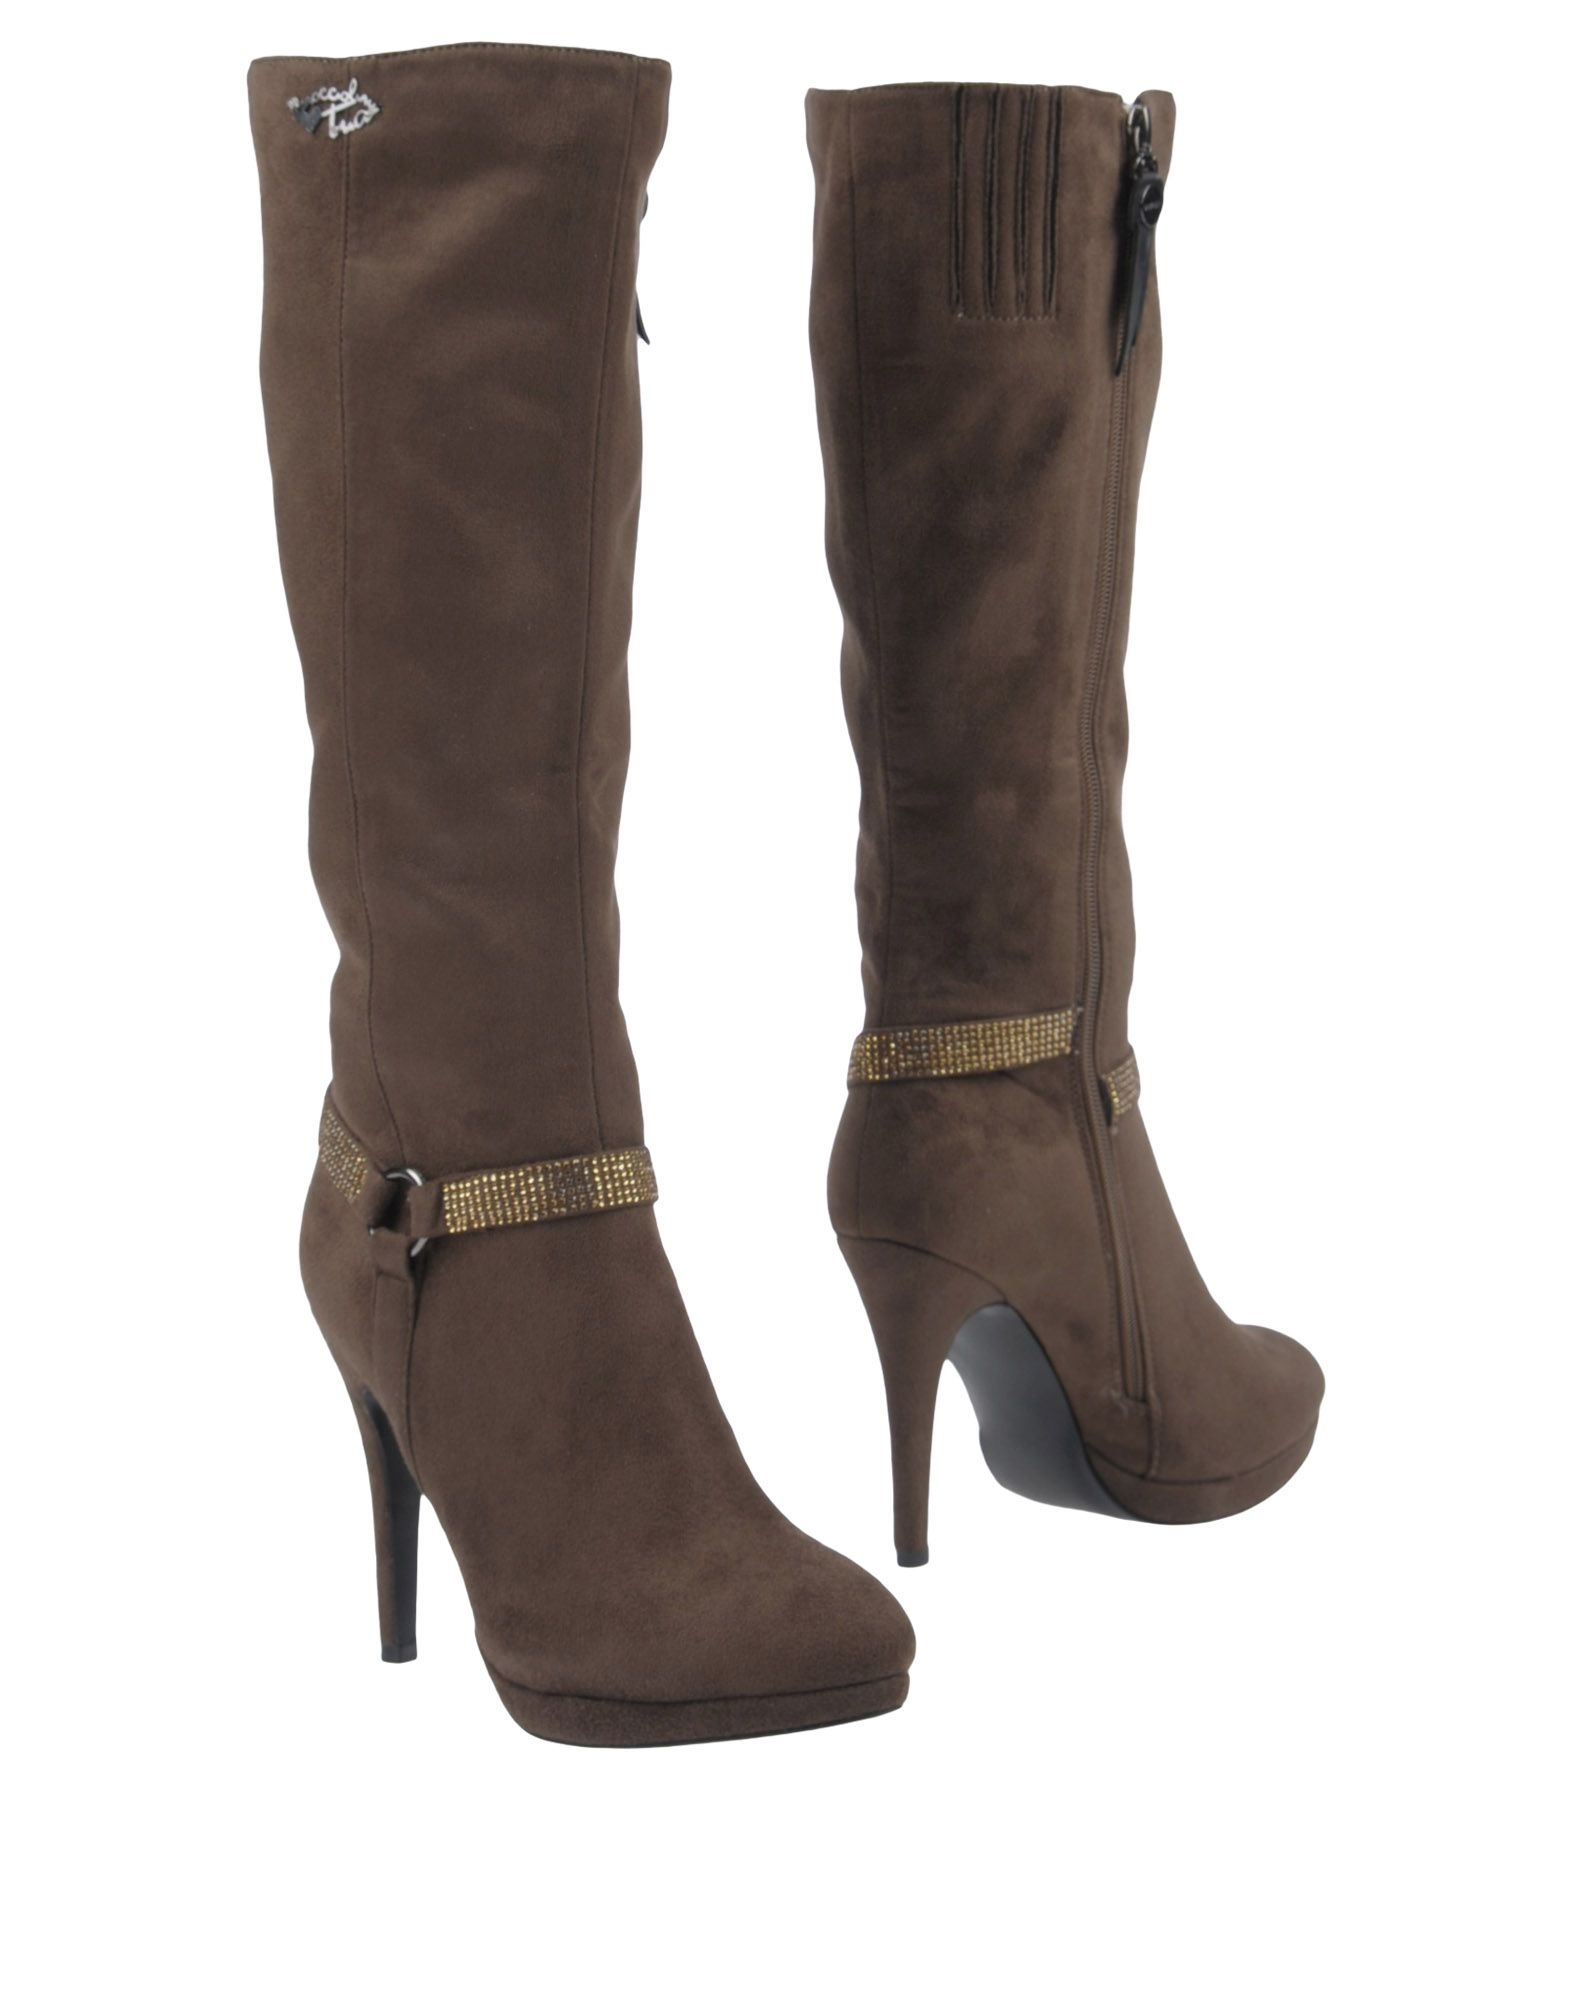 Tua By Braccialini Boots Braccialini - Women Tua By Braccialini Boots Boots online on  Canada - 11448772OS f31835